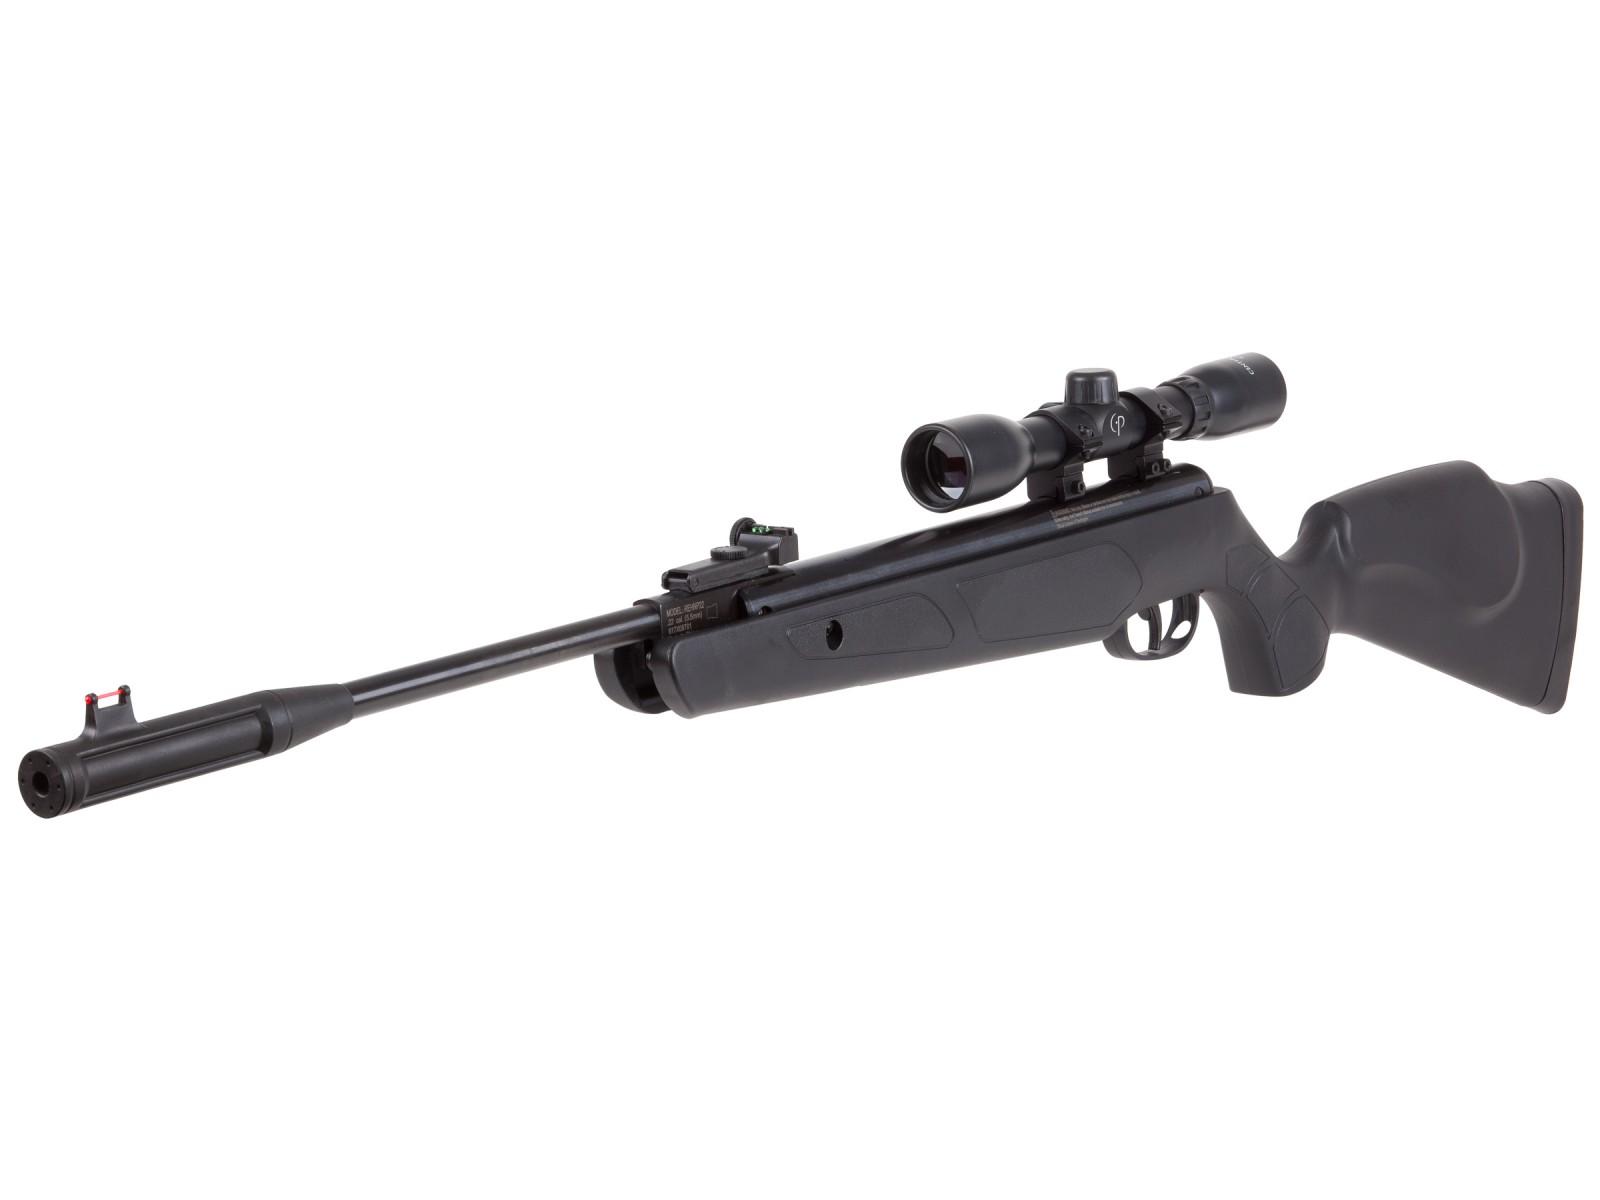 Remington Express Hunter, Nitro Gas Piston, Air Rifle 0.22 Image